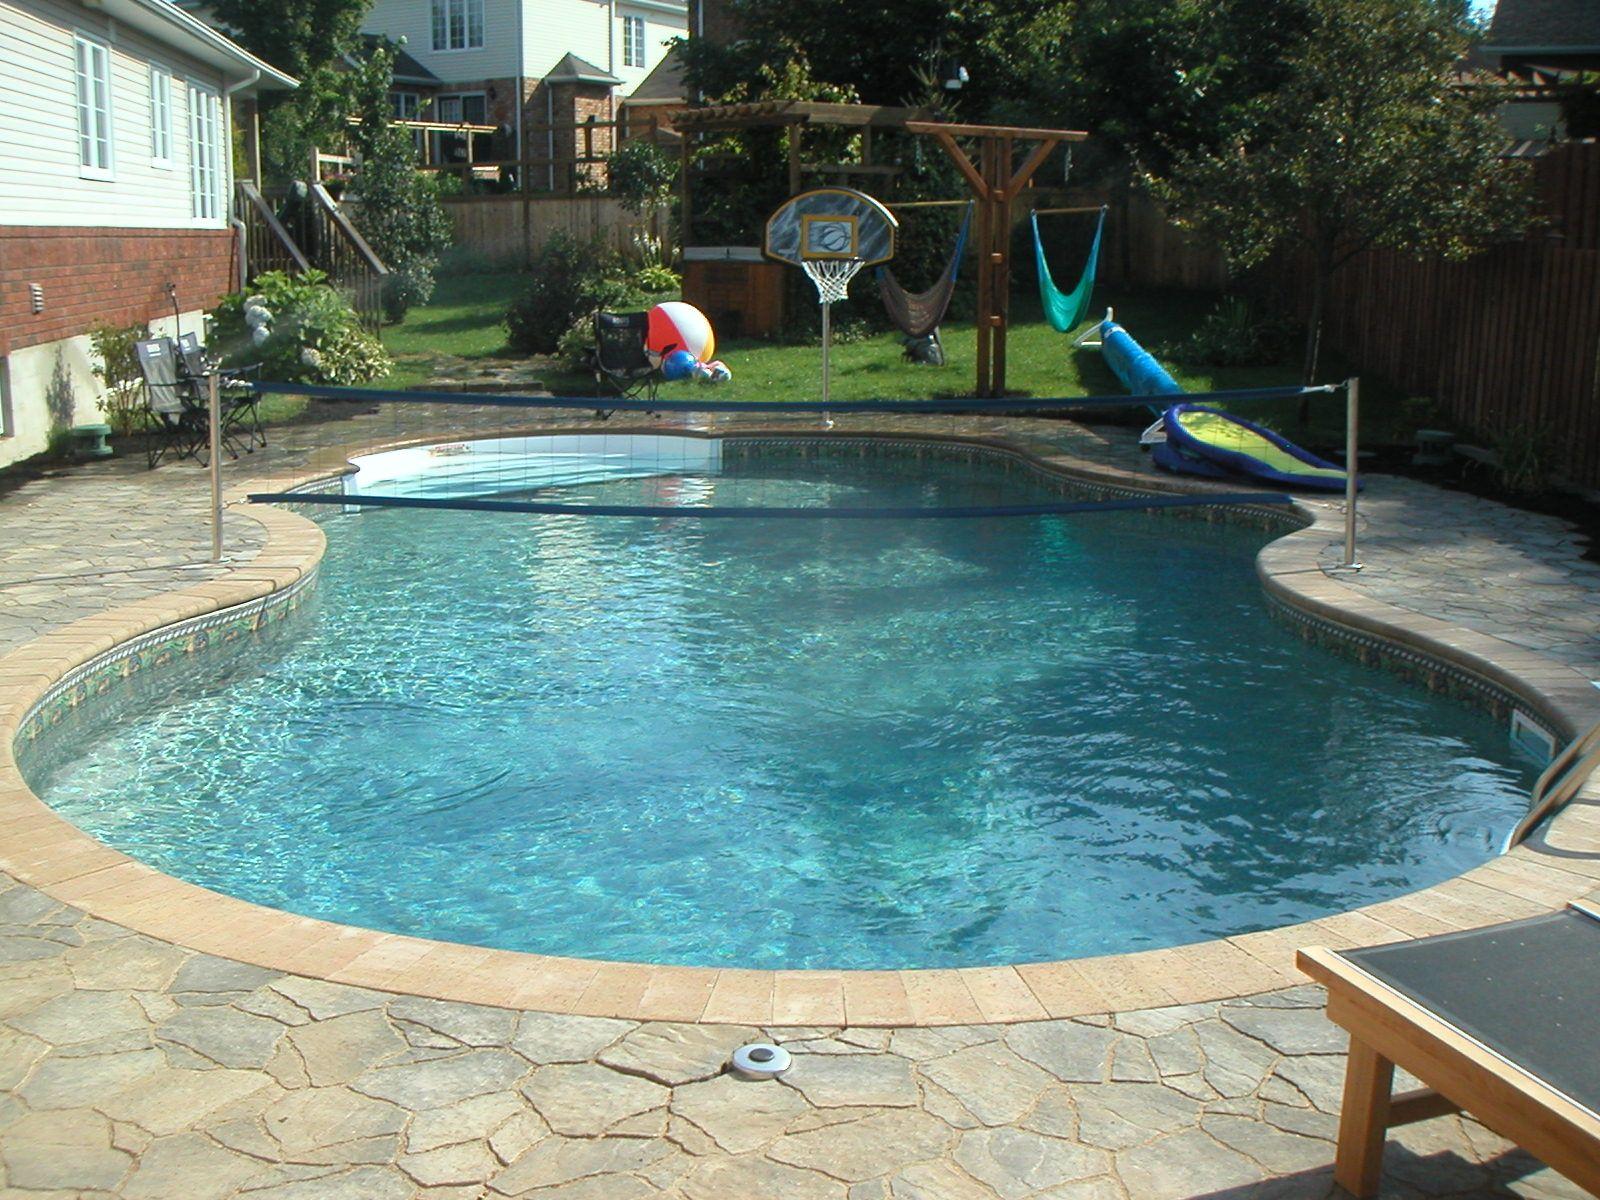 18x36 Lagoona Inground Pool With Custom Volleyball Net And 11ft Roman Step Inground Swimming